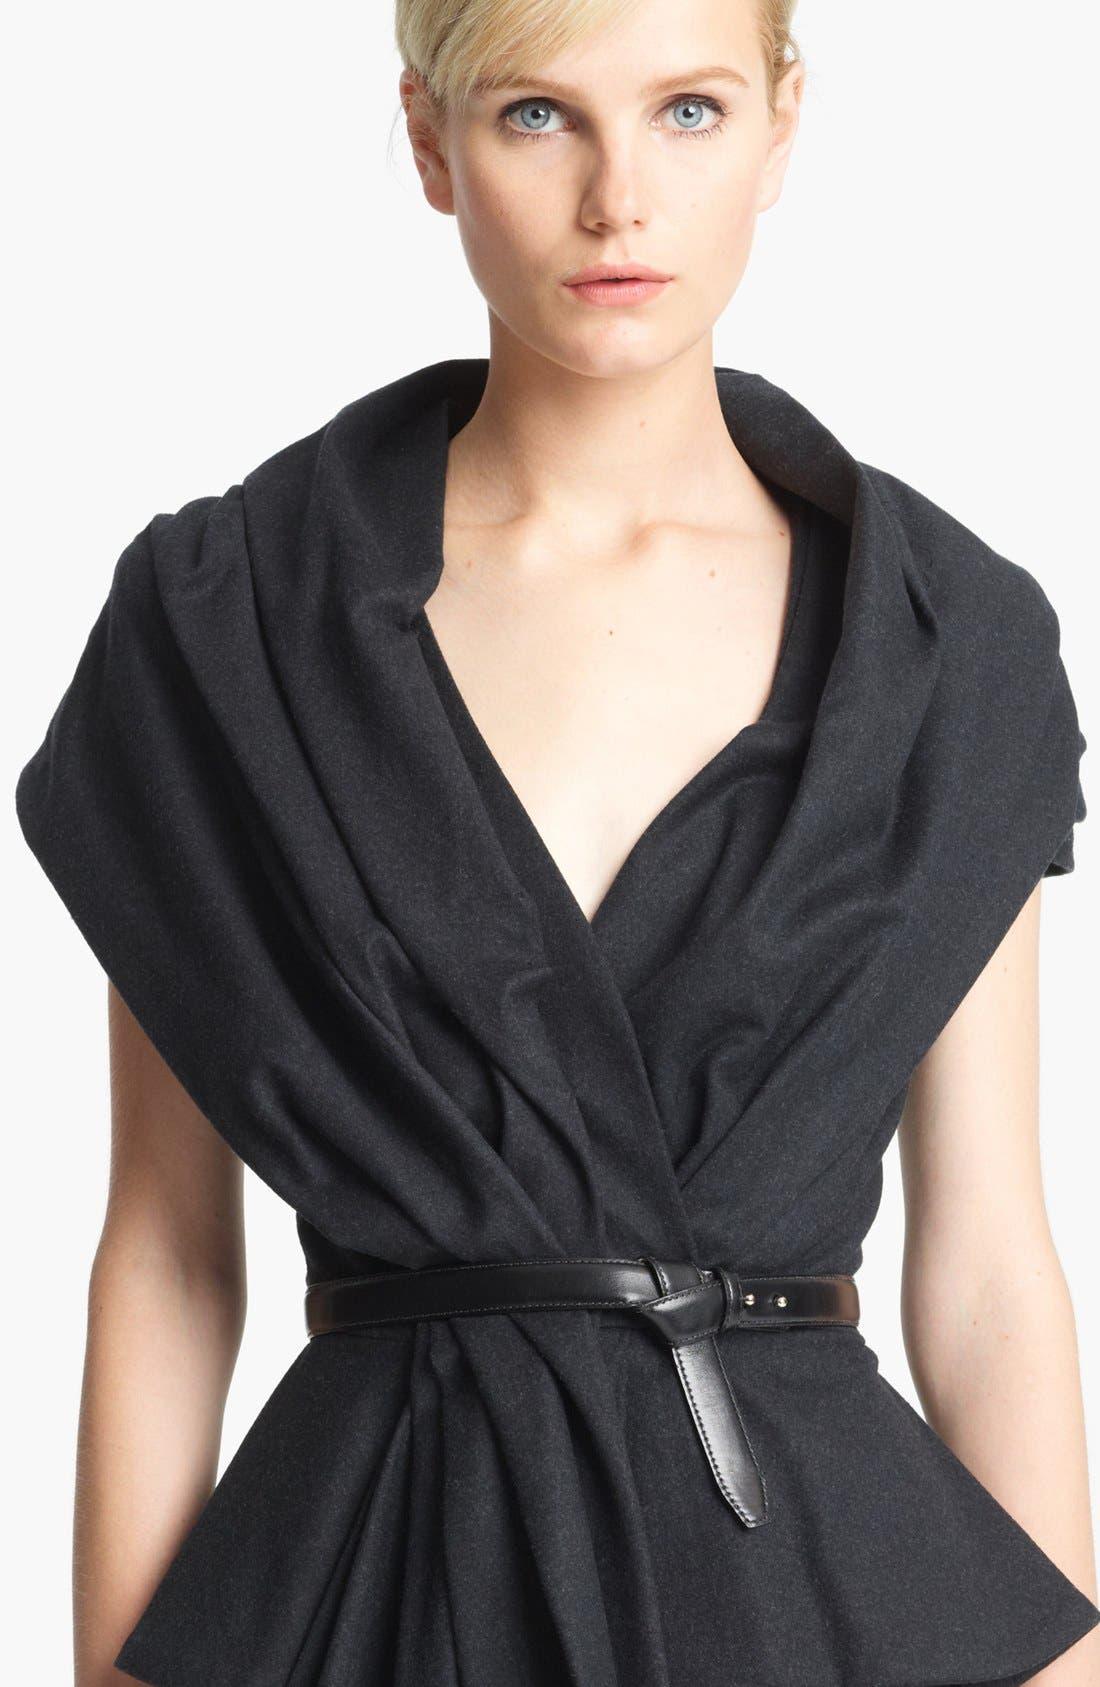 Alternate Image 1 Selected - Oscar de la Renta Tie Front Leather Belt